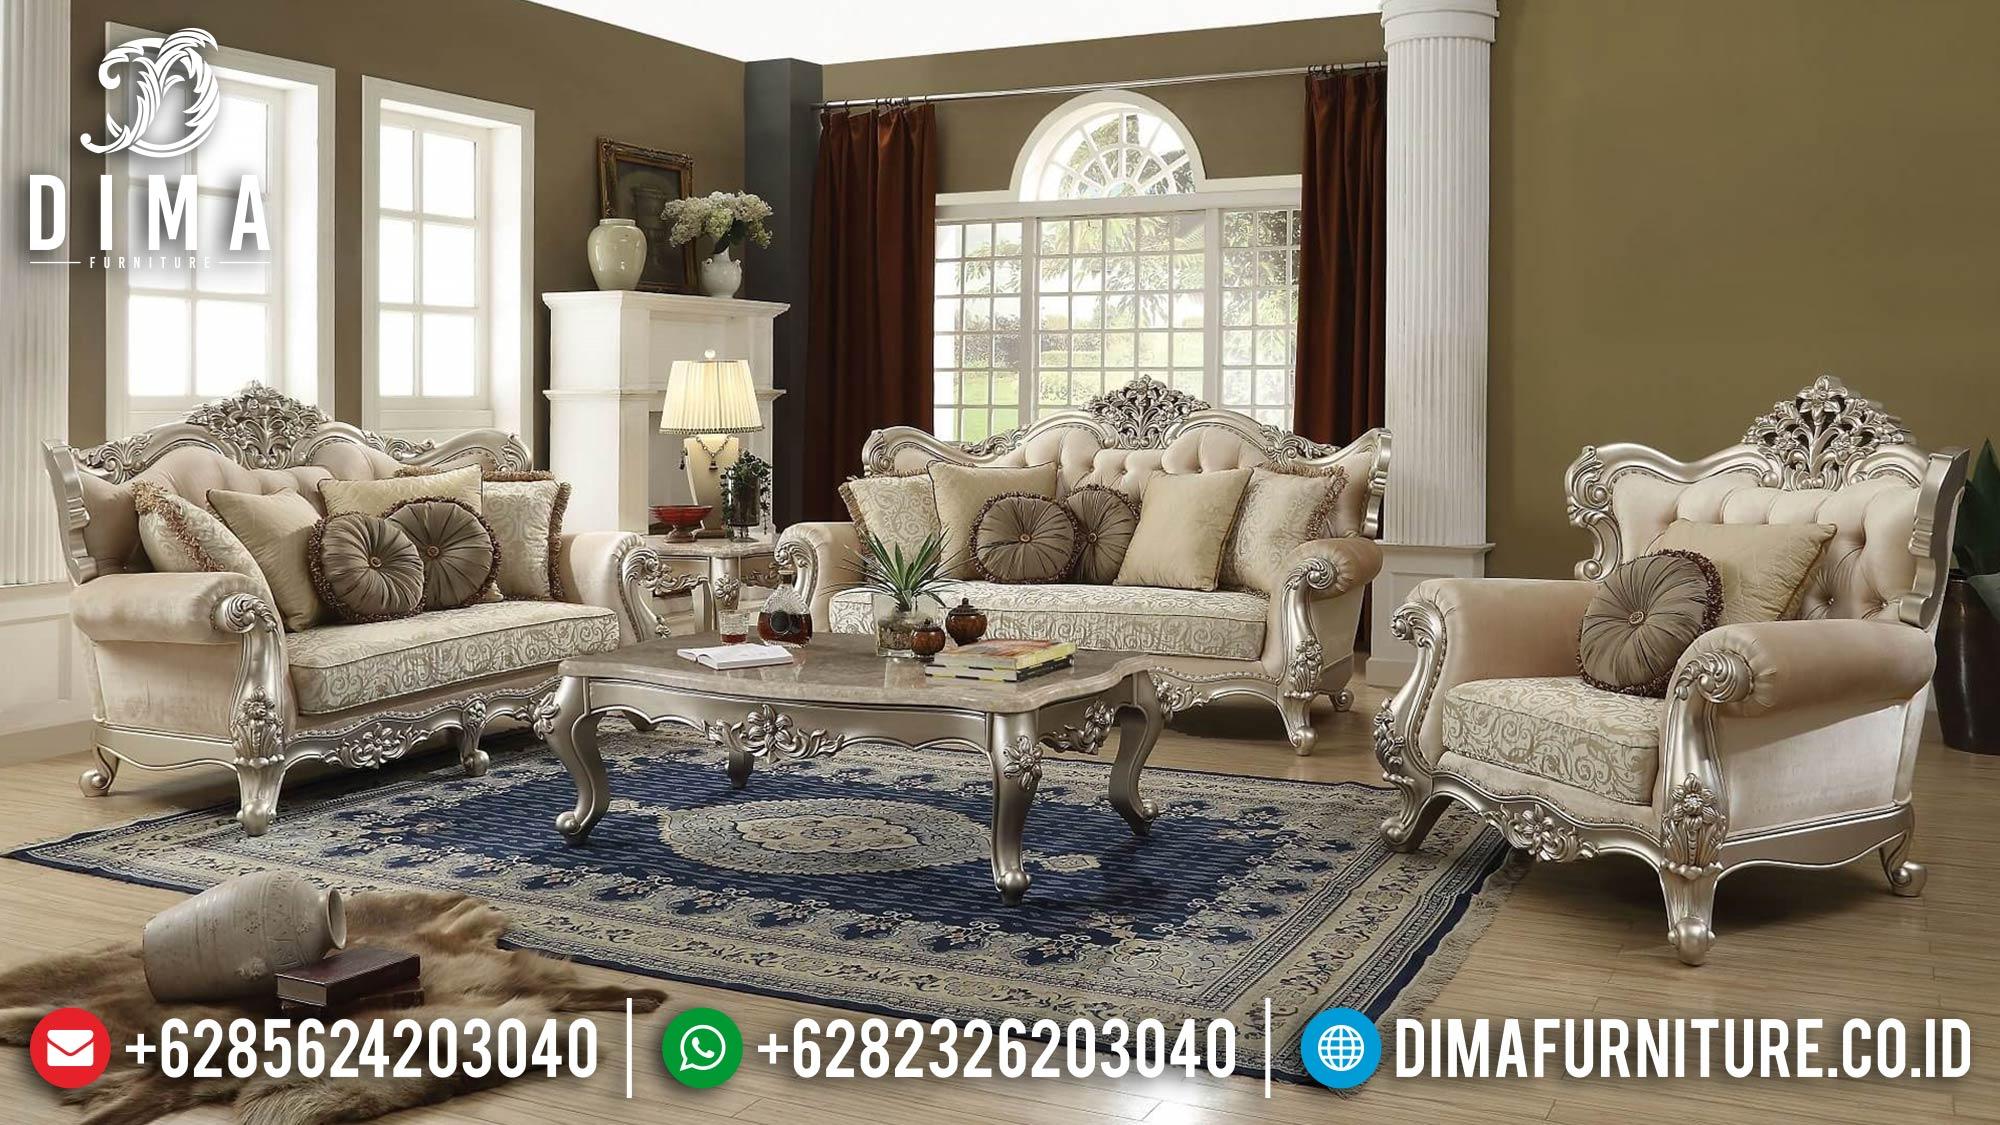 Sofa Tamu Jepara Mewah Ukiran Luxury Excellent Duco Color ST-1377